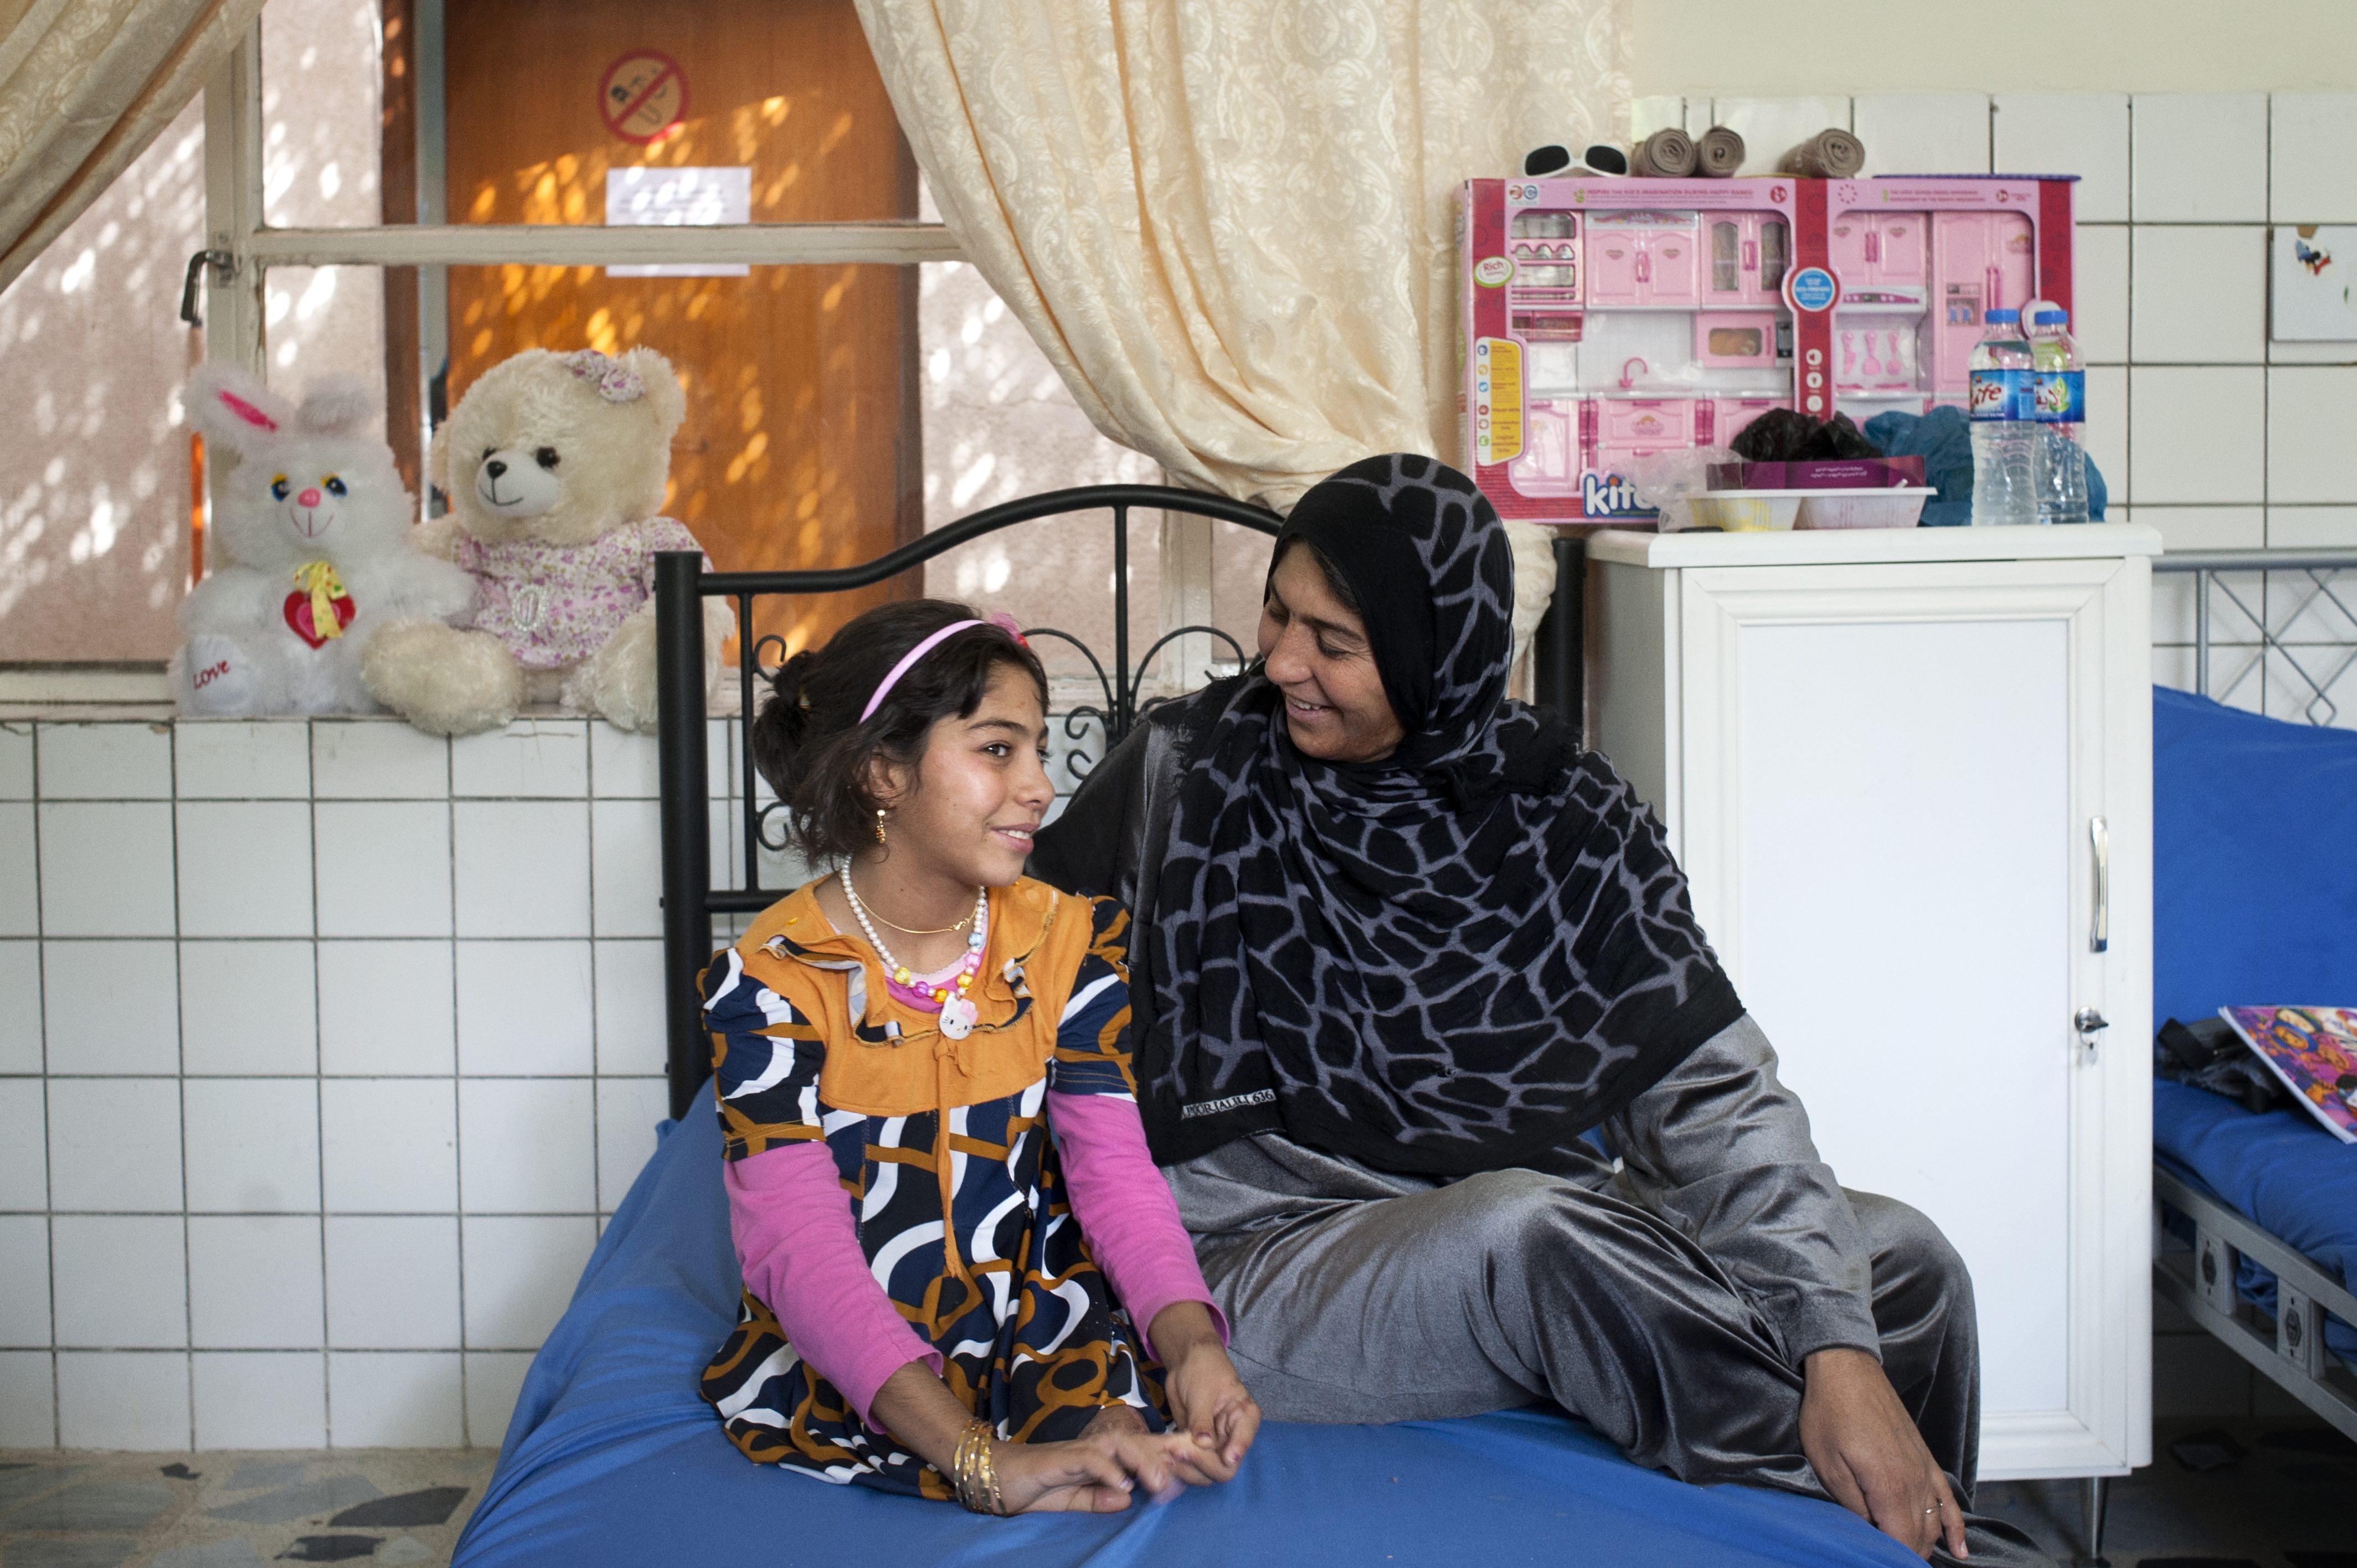 Iraq: Ahlam's Story